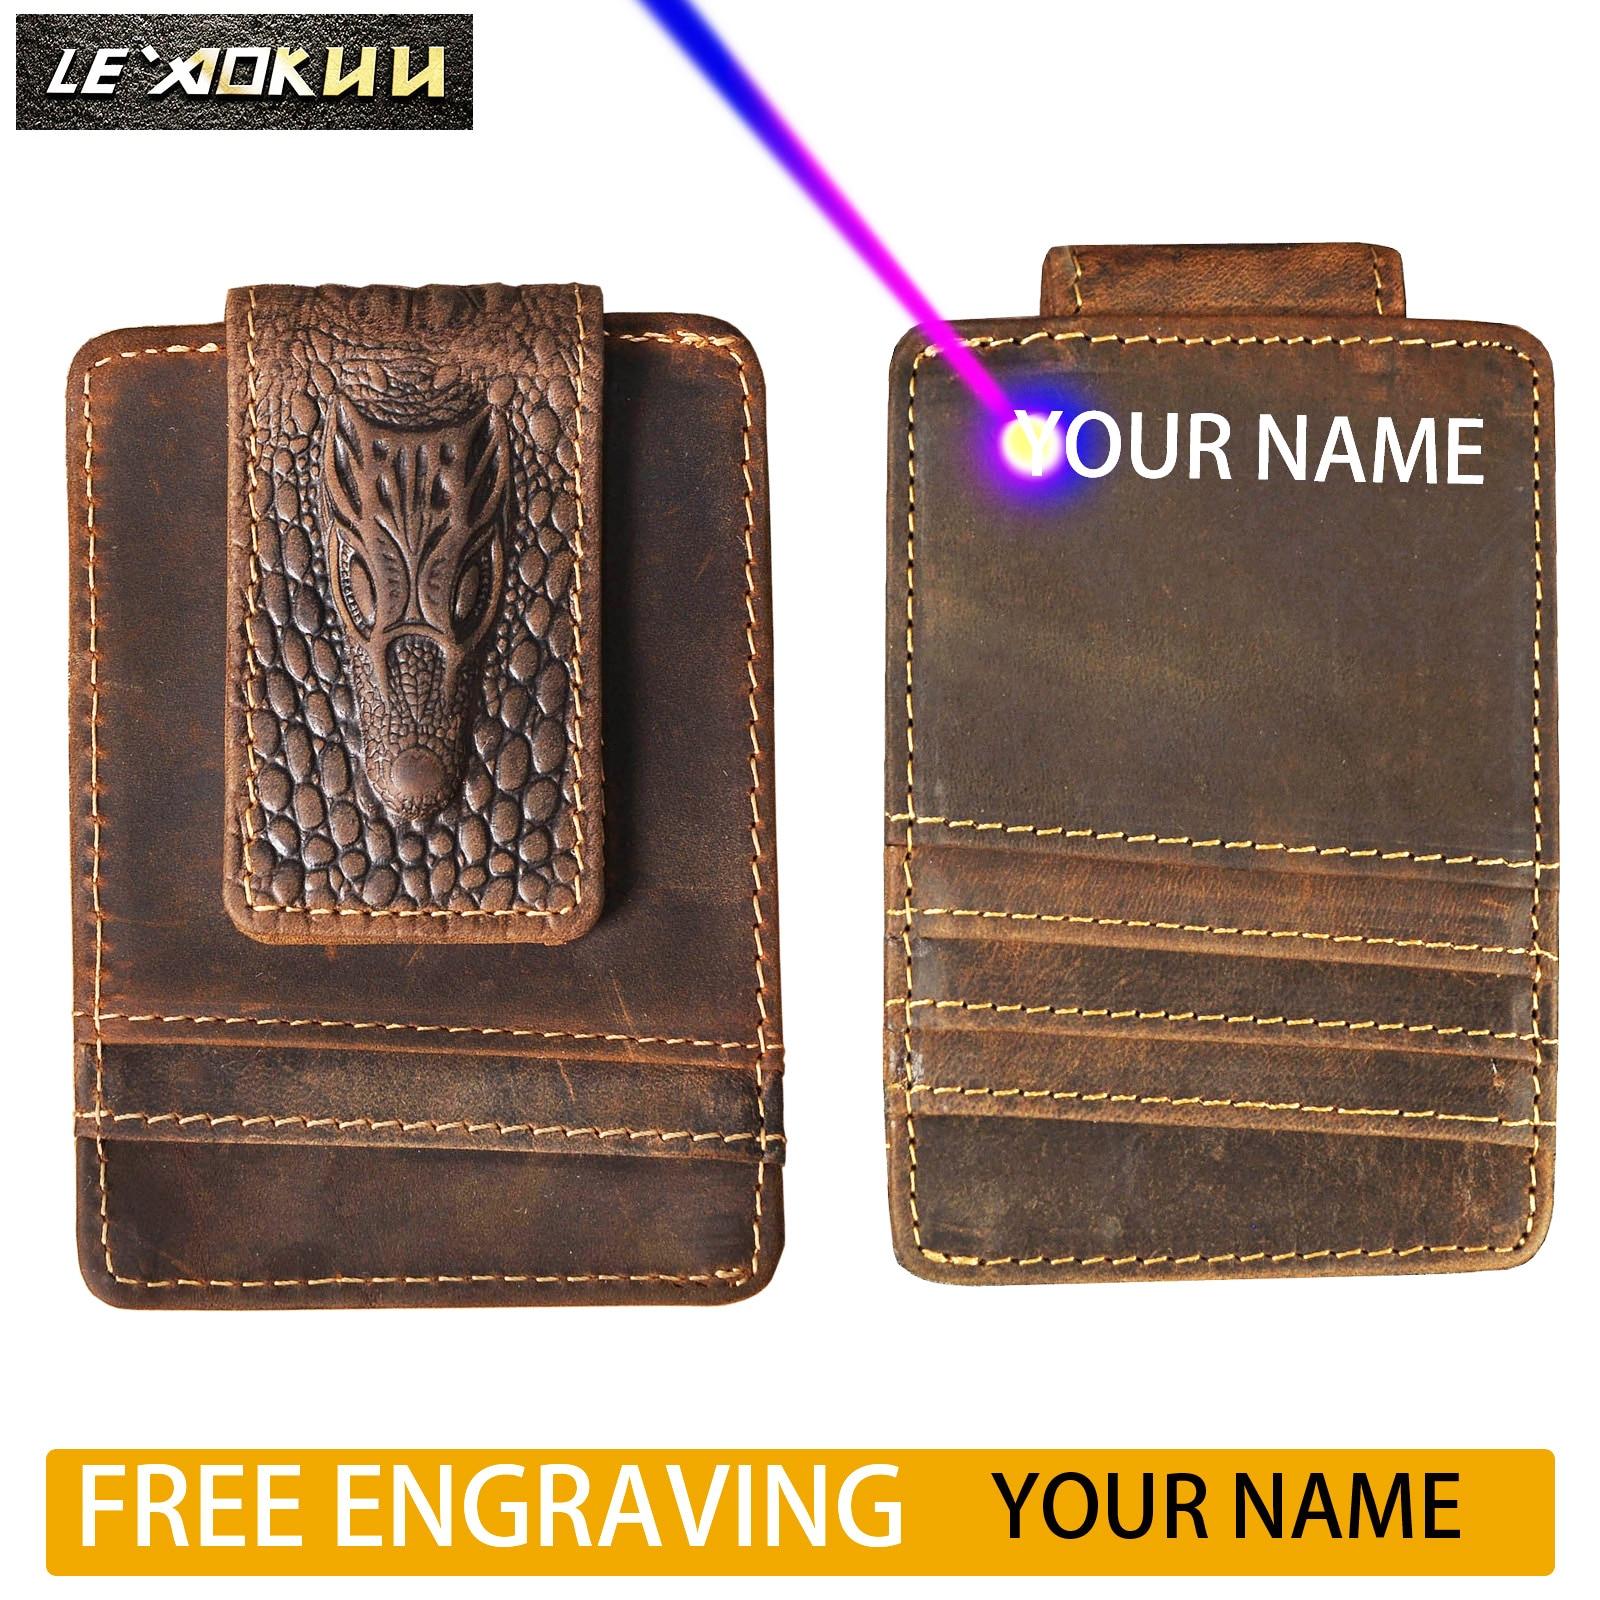 2020 Original New Cattle Men Male Vintage Leather Card Holder Case Magnet Money Clip Slim Mini Handy Pocket Wallet Purse 1058-d